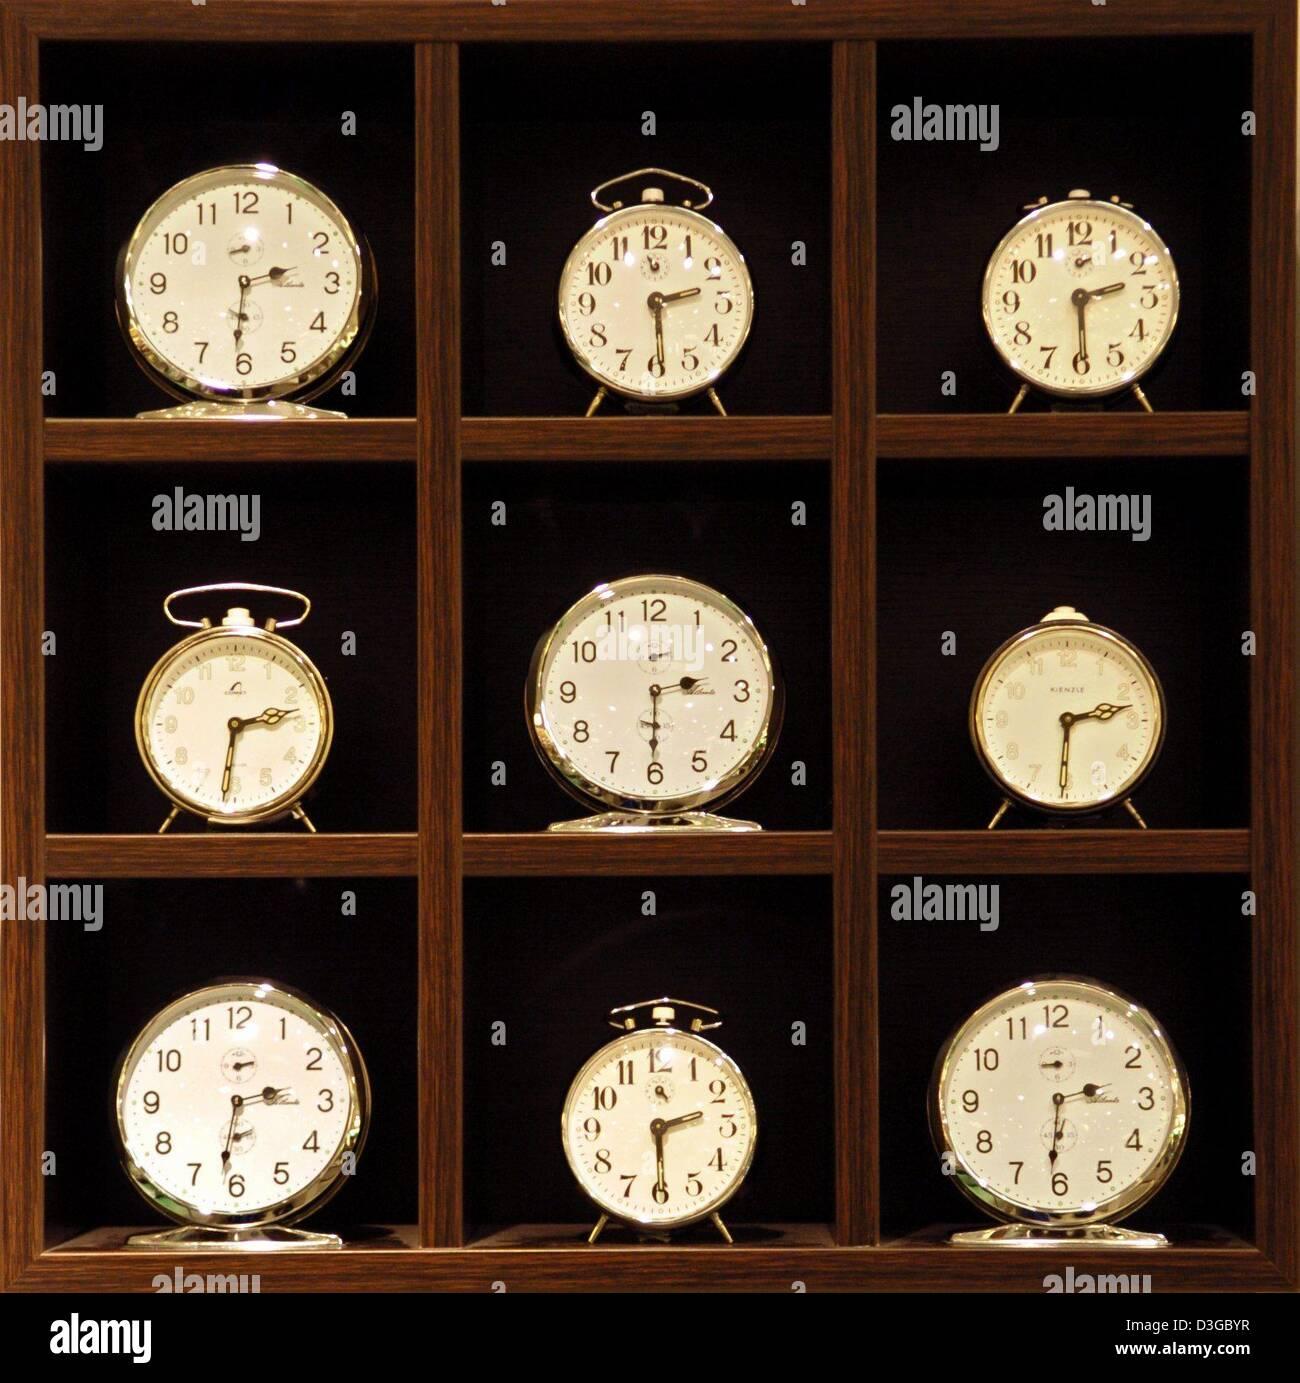 Radio Controlled Clocks Stock Photos Amp Radio Controlled Clocks Stock Images